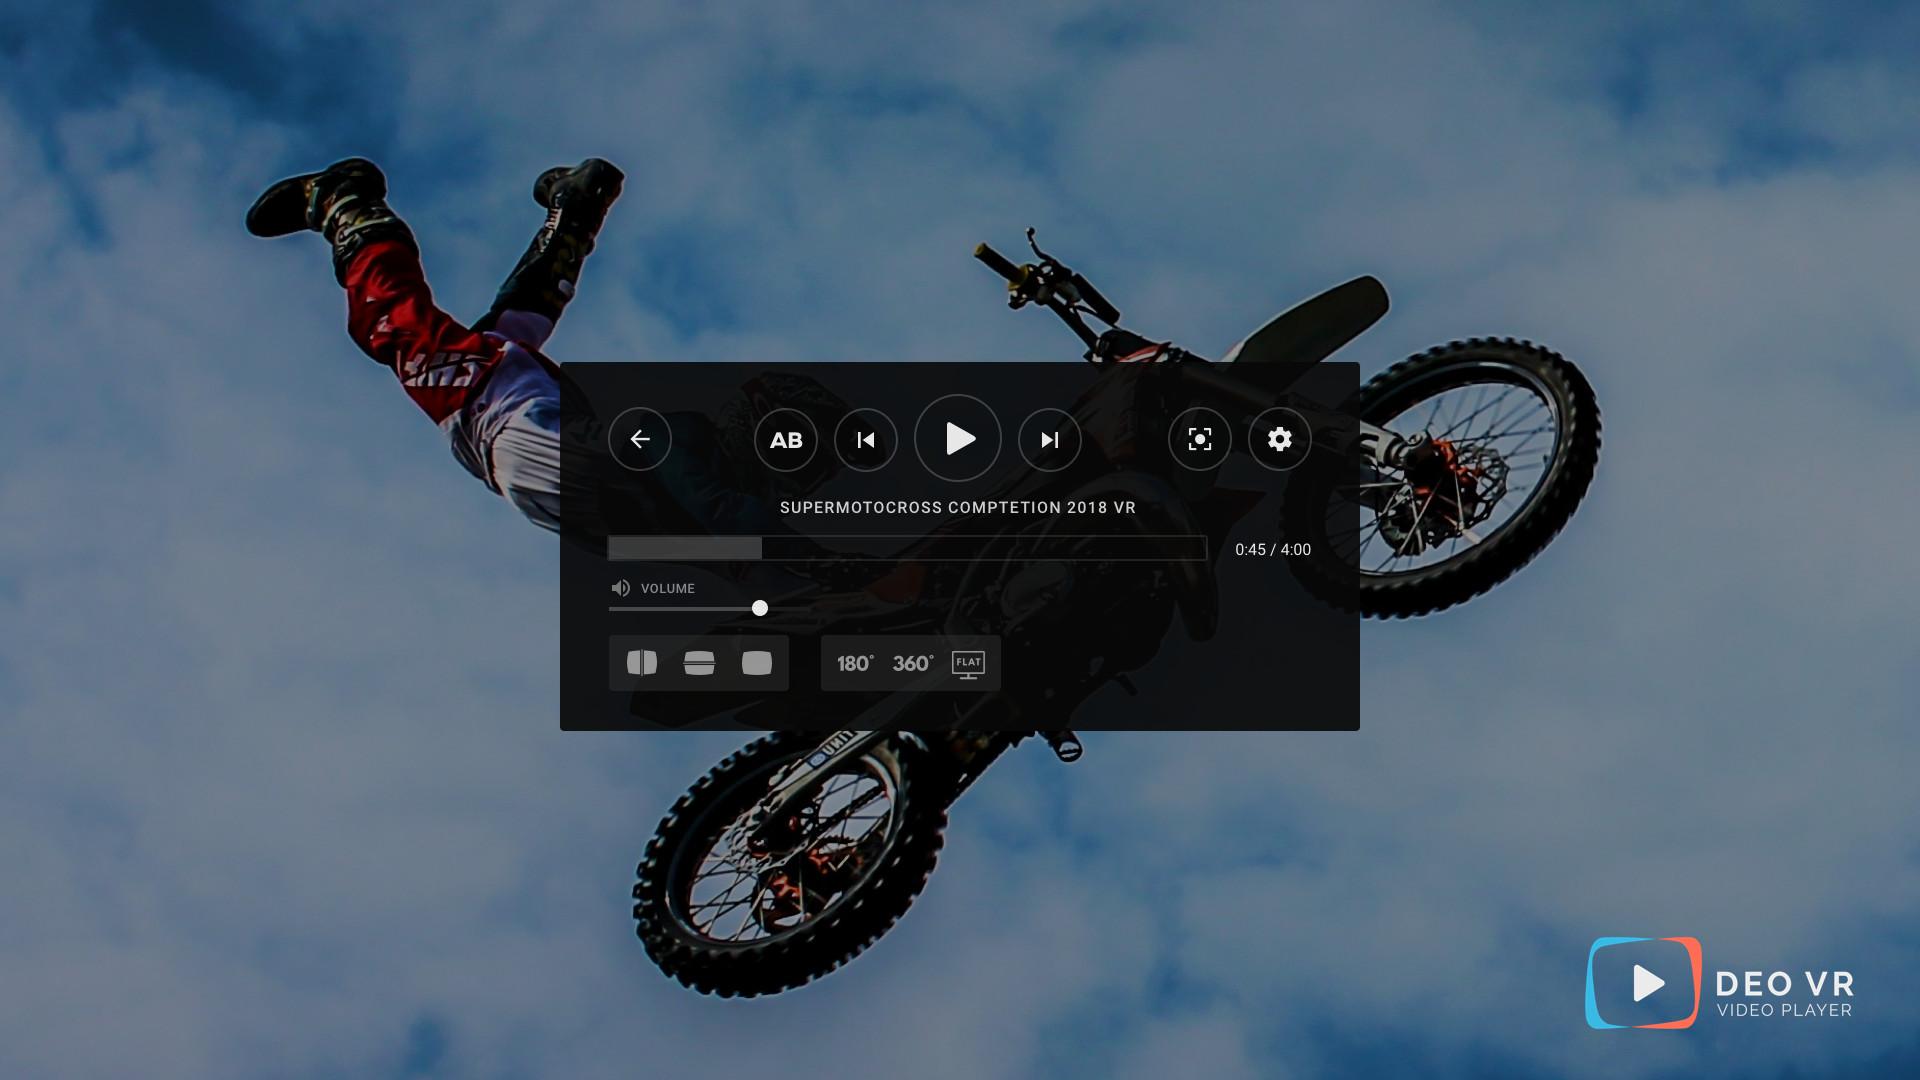 DeoVR Video Player on Steam